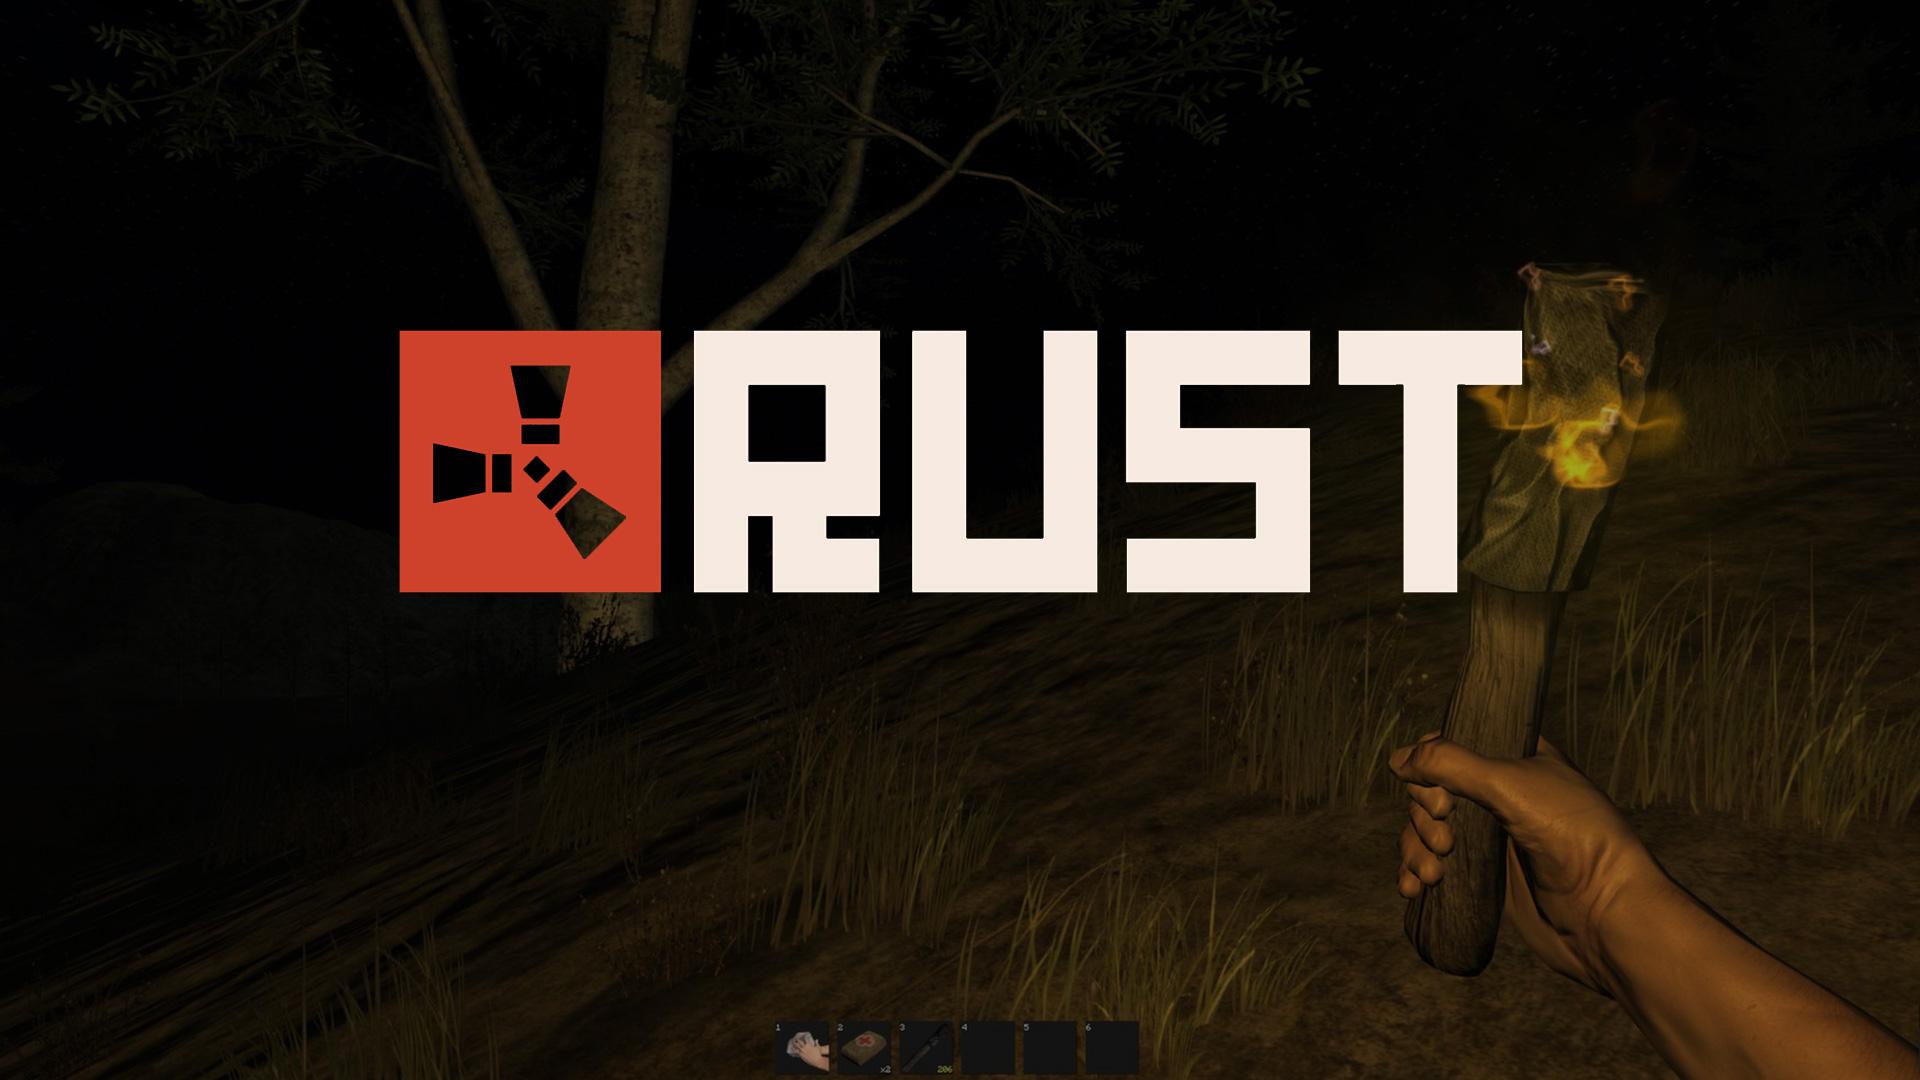 Rust Wallpapers Screenshots 1920x1080